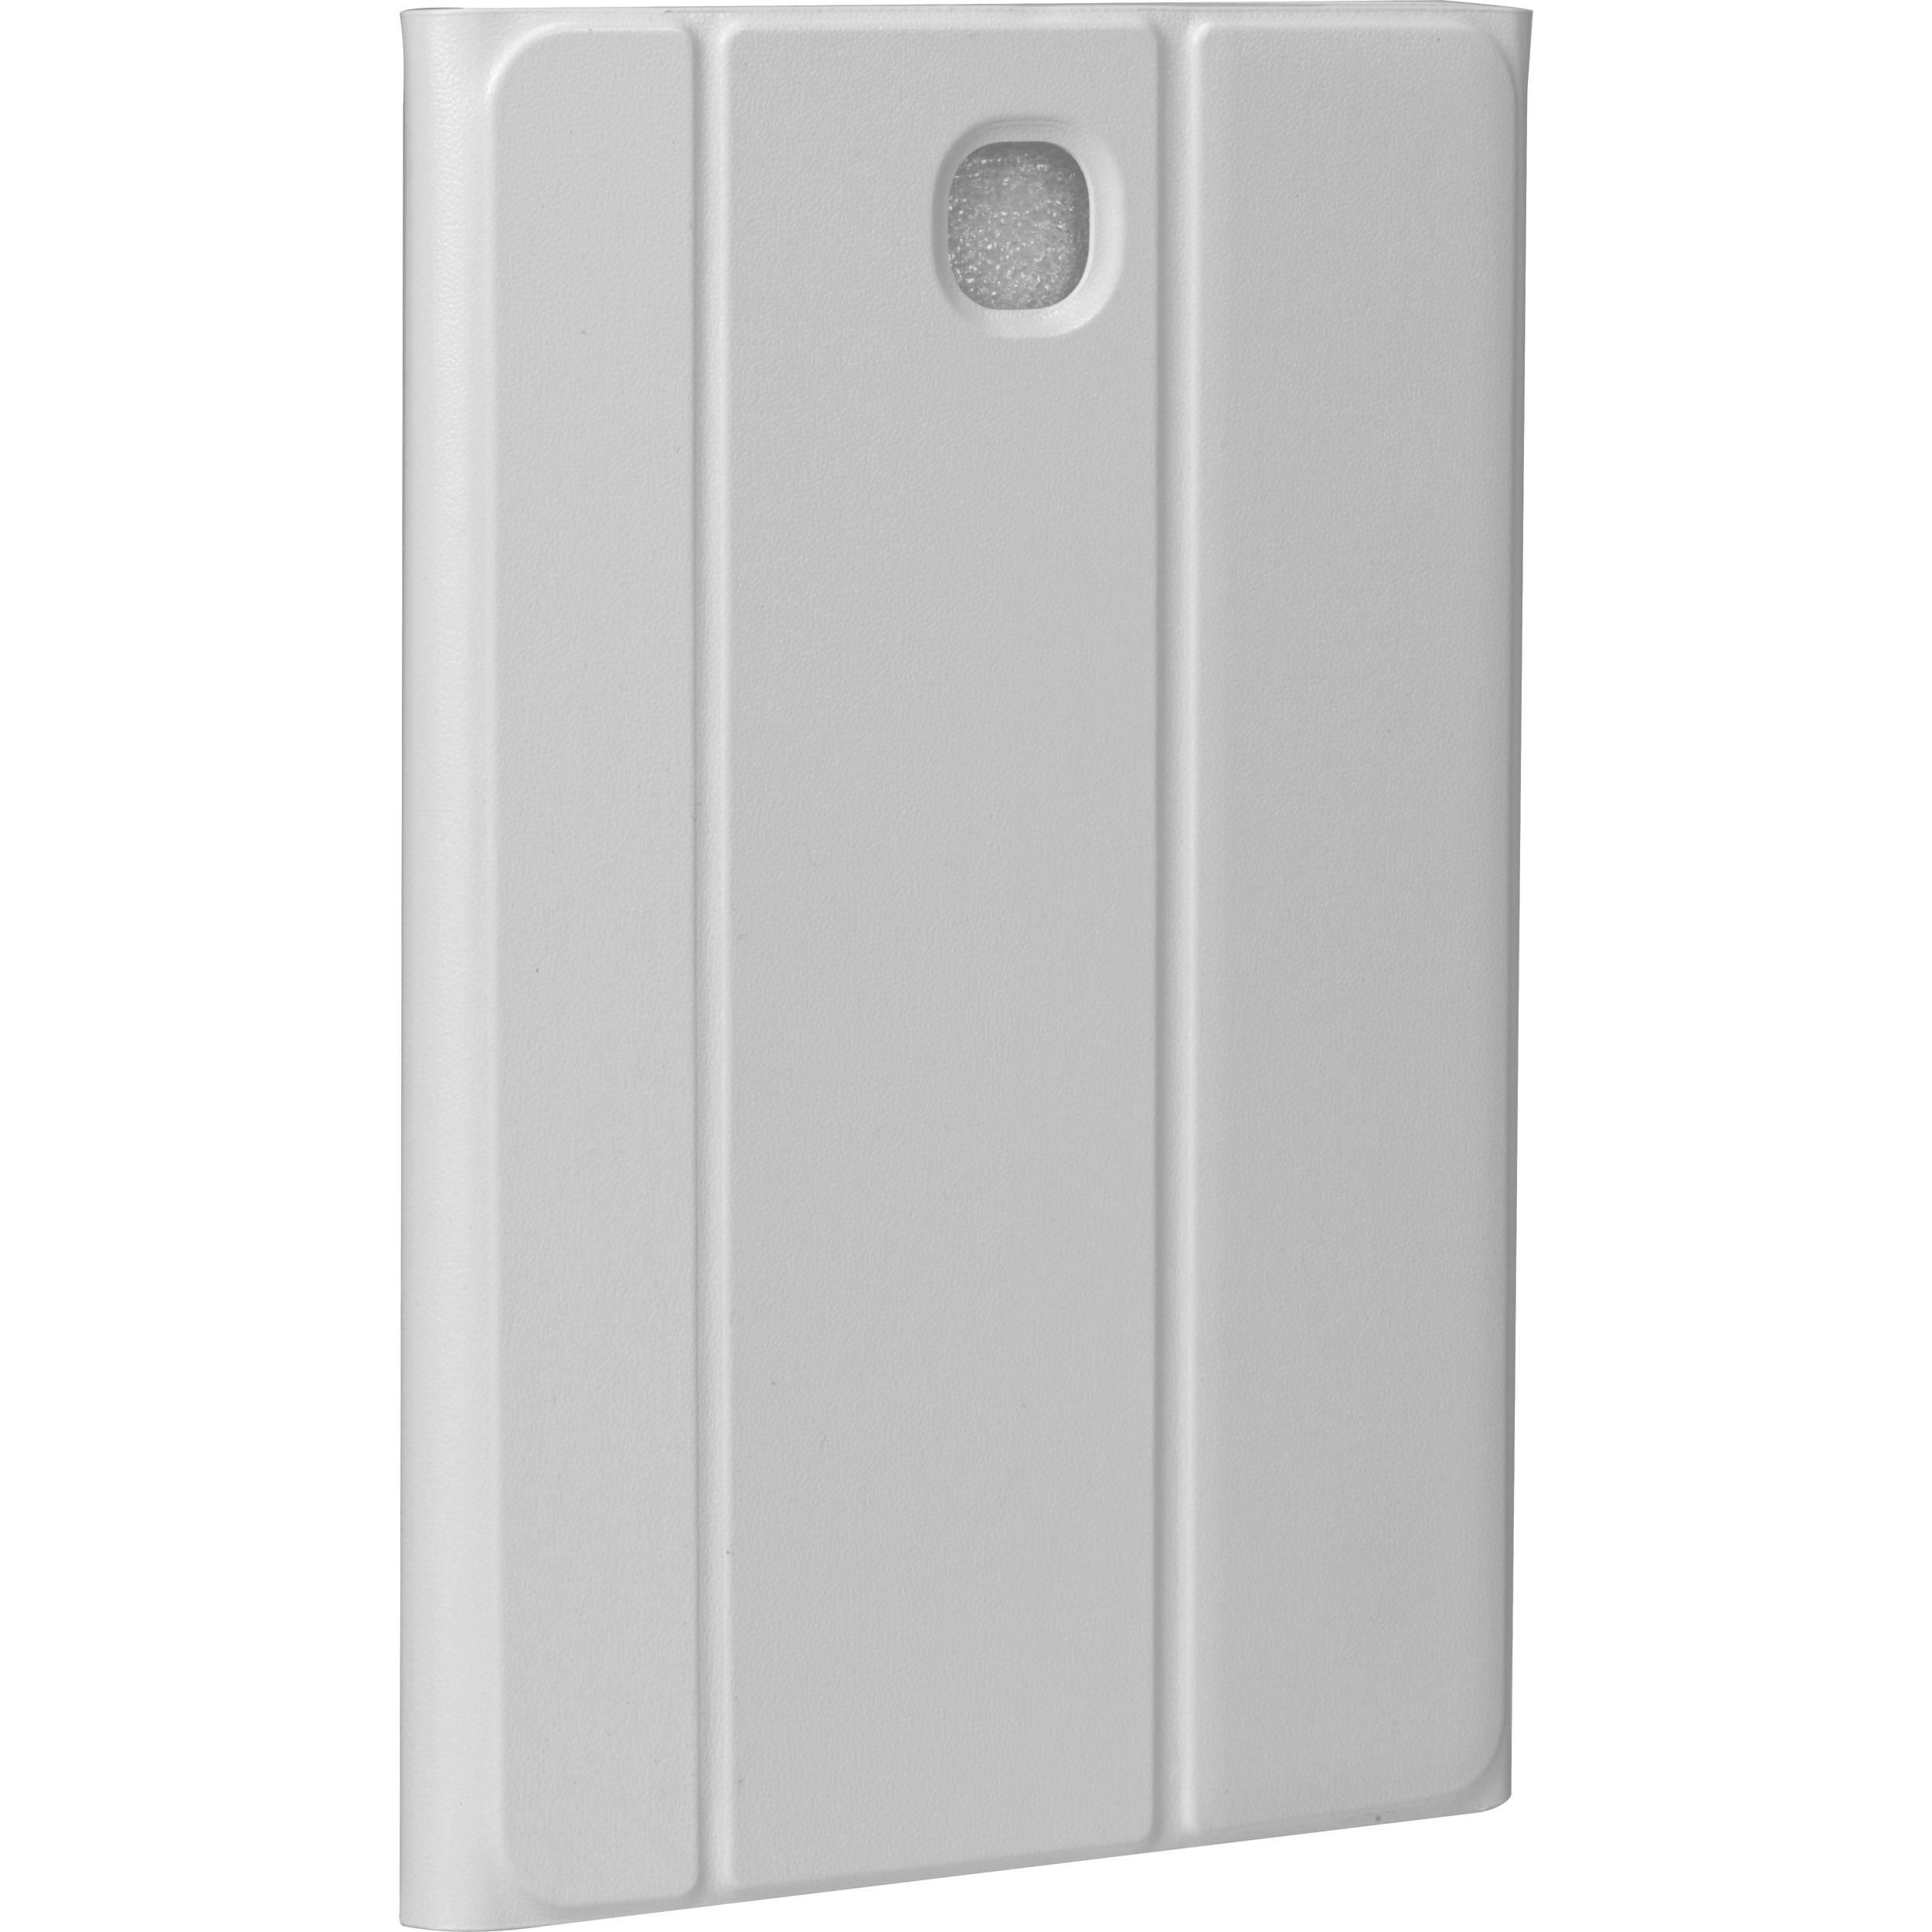 Samsung Book Cover Tab A White : Samsung book cover for galaxy tab a quot ef bt pweguj b h